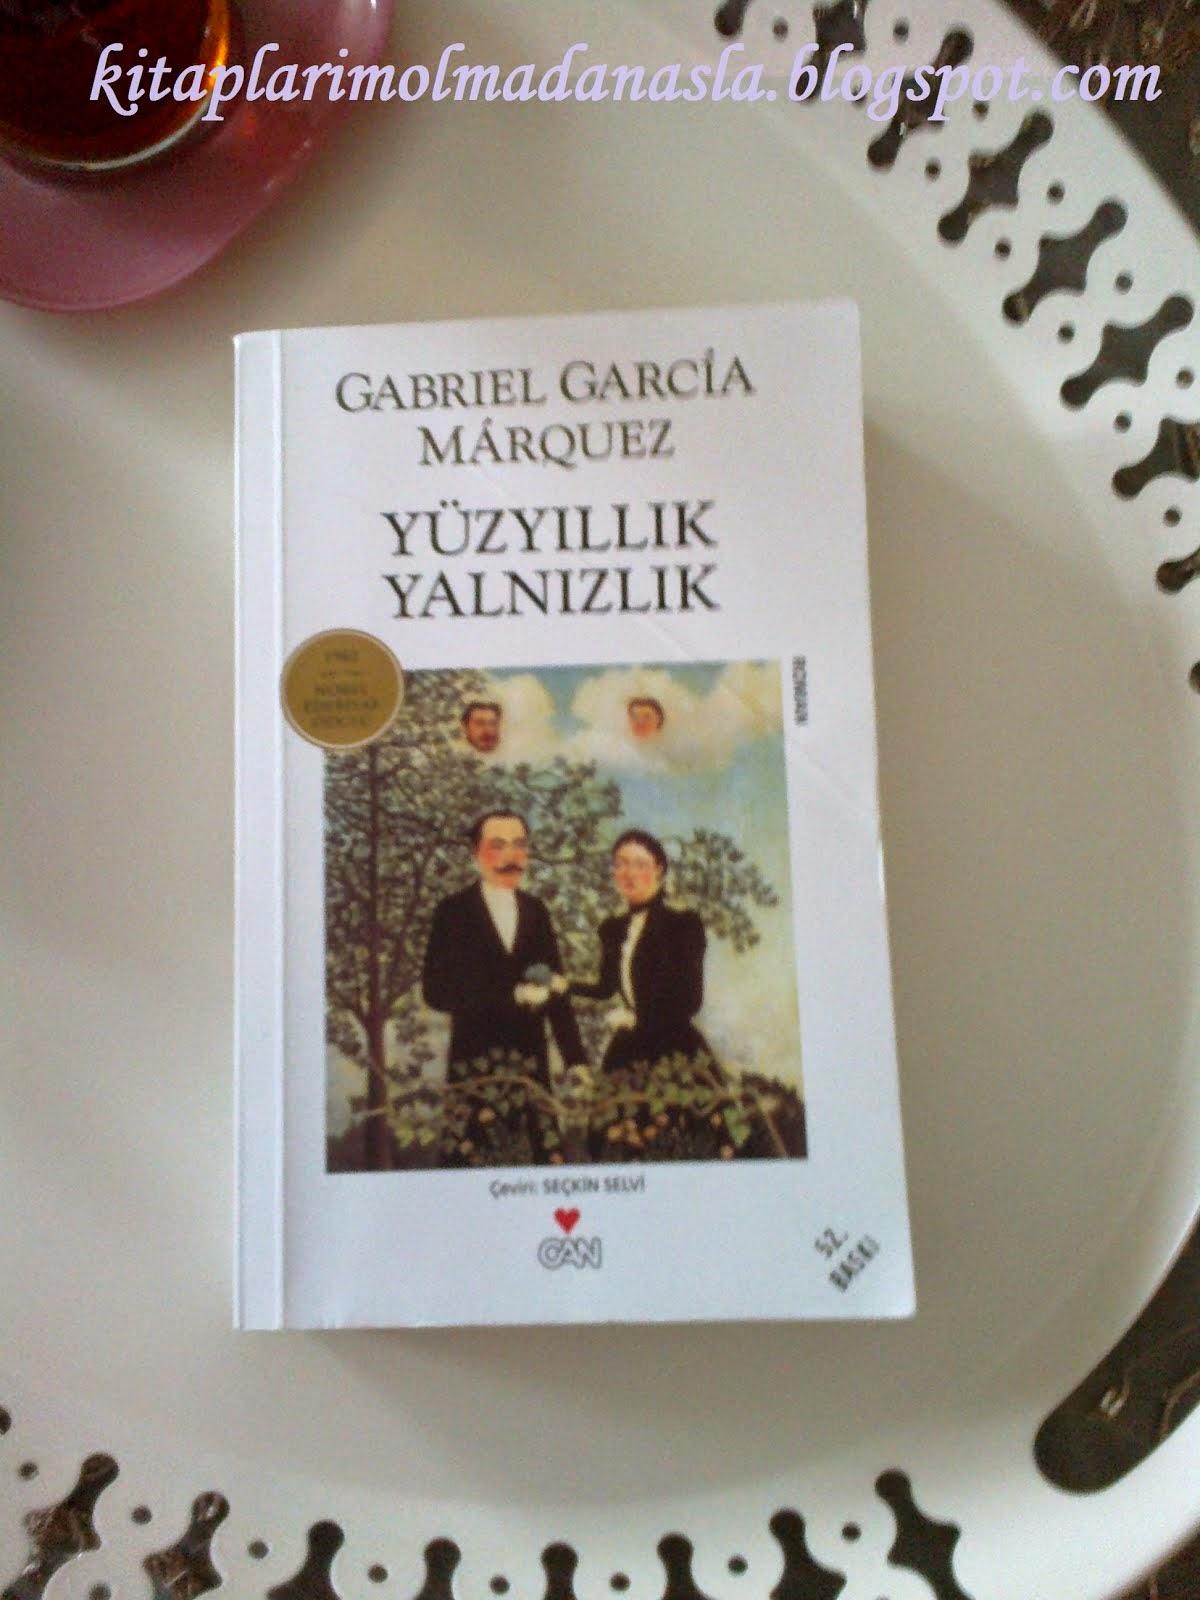 GABRİEL GARCİA MARQUEZ - YÜZYILLIK YALNIZLIK